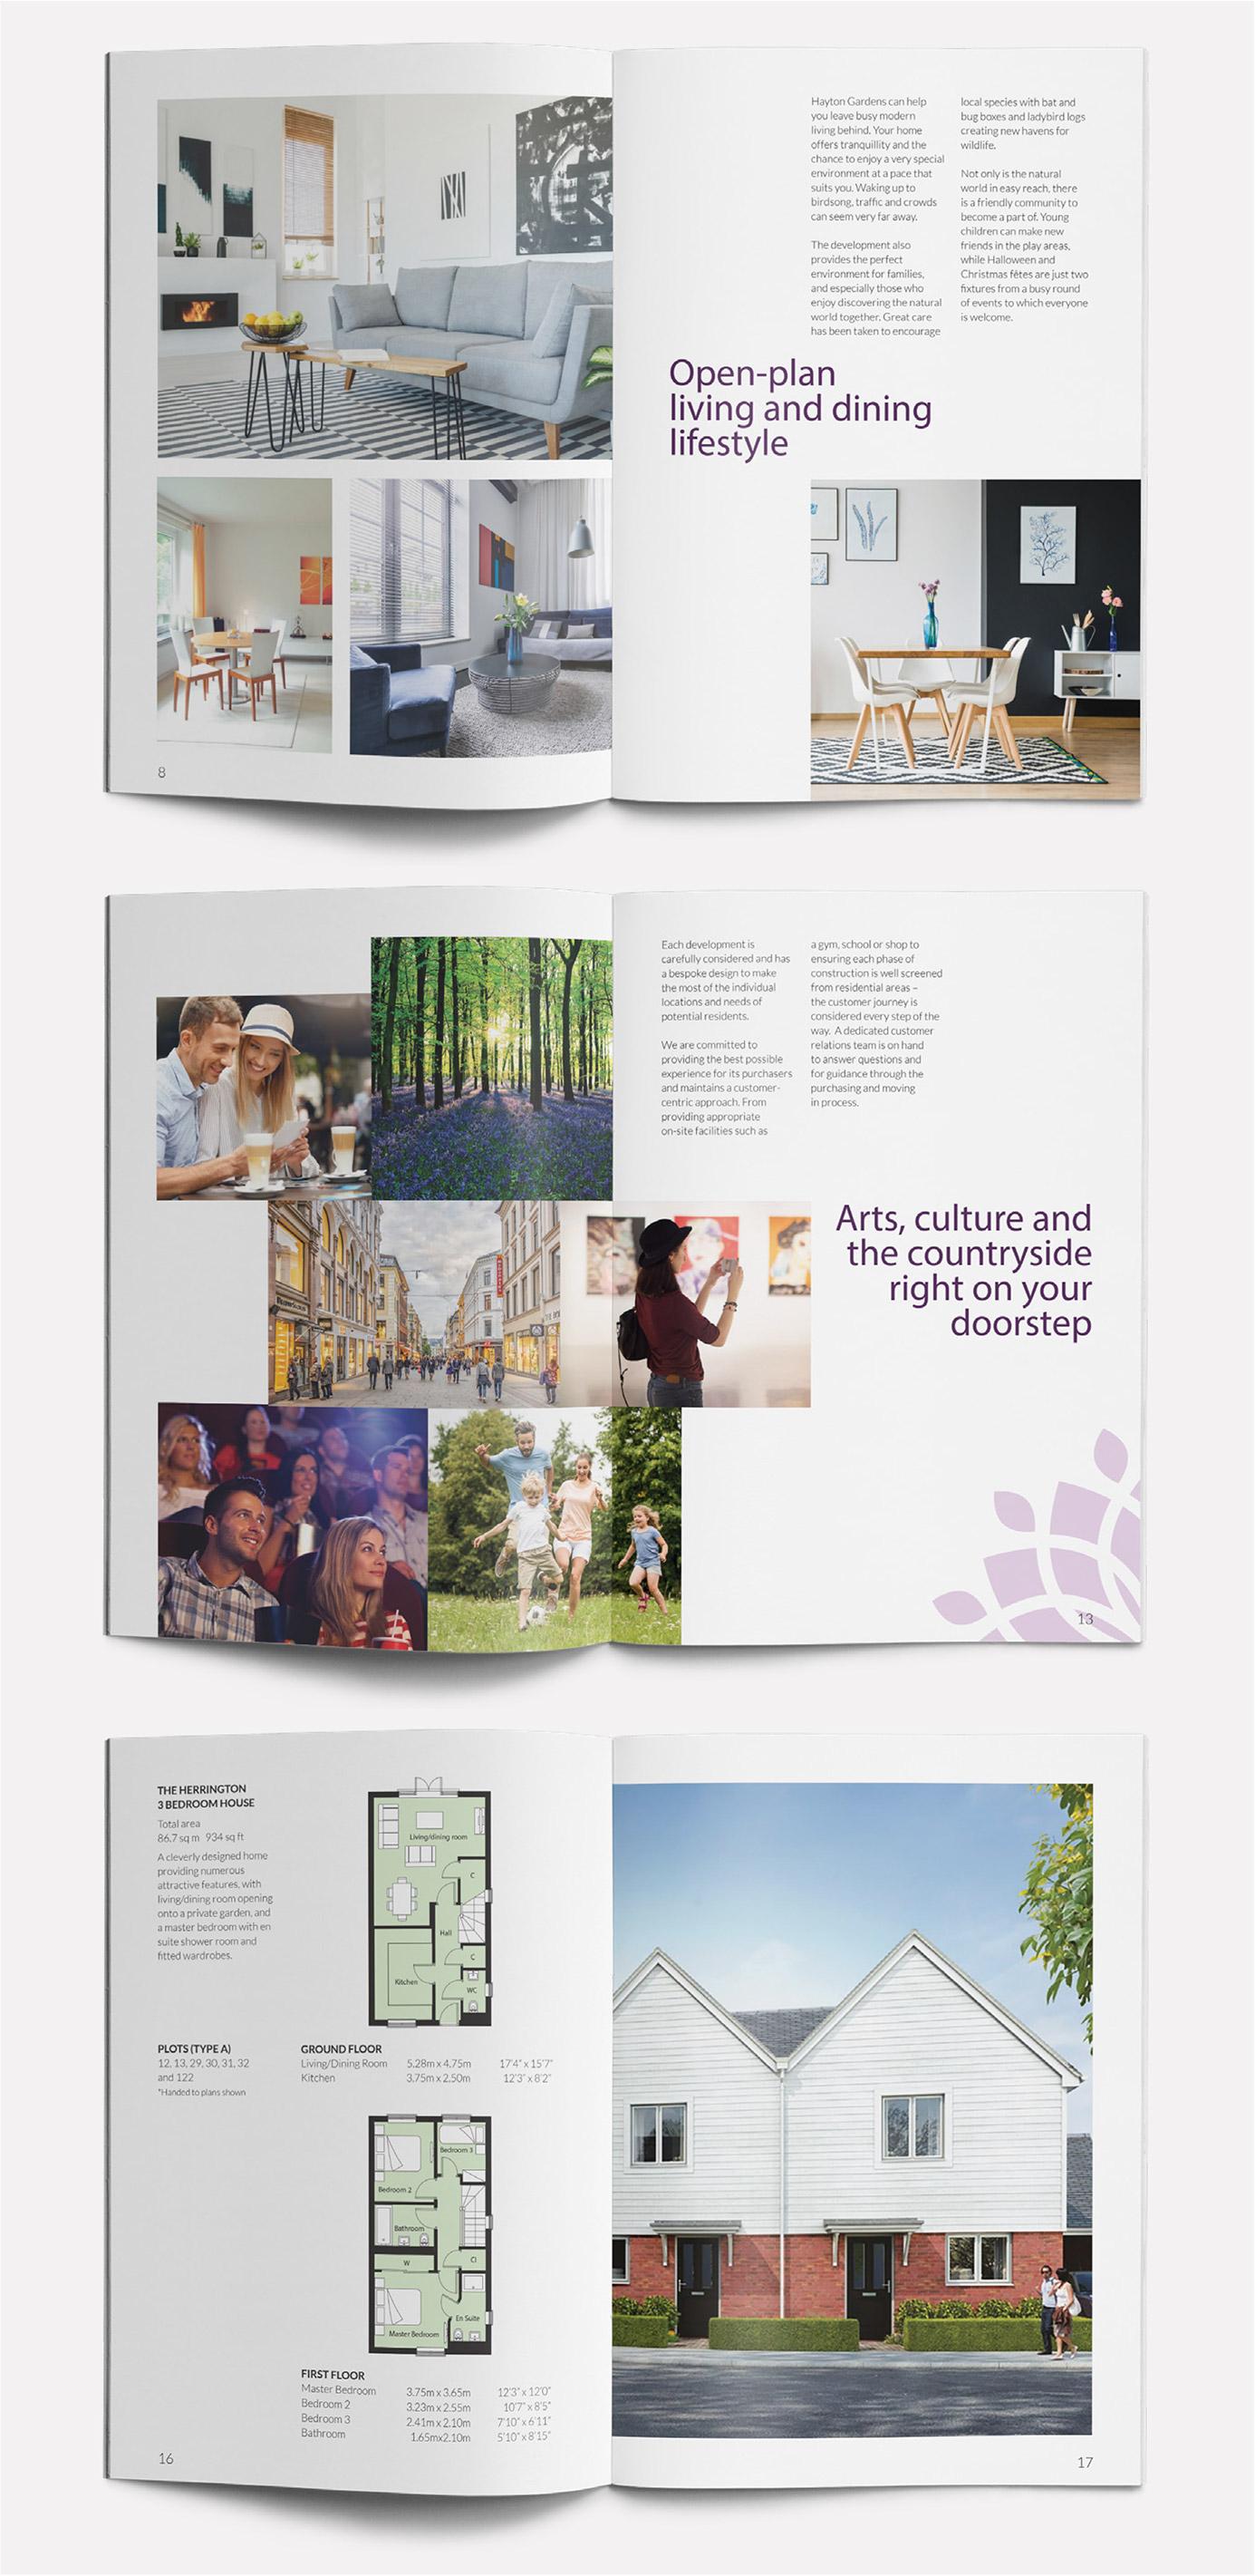 hayton-gardens-image3